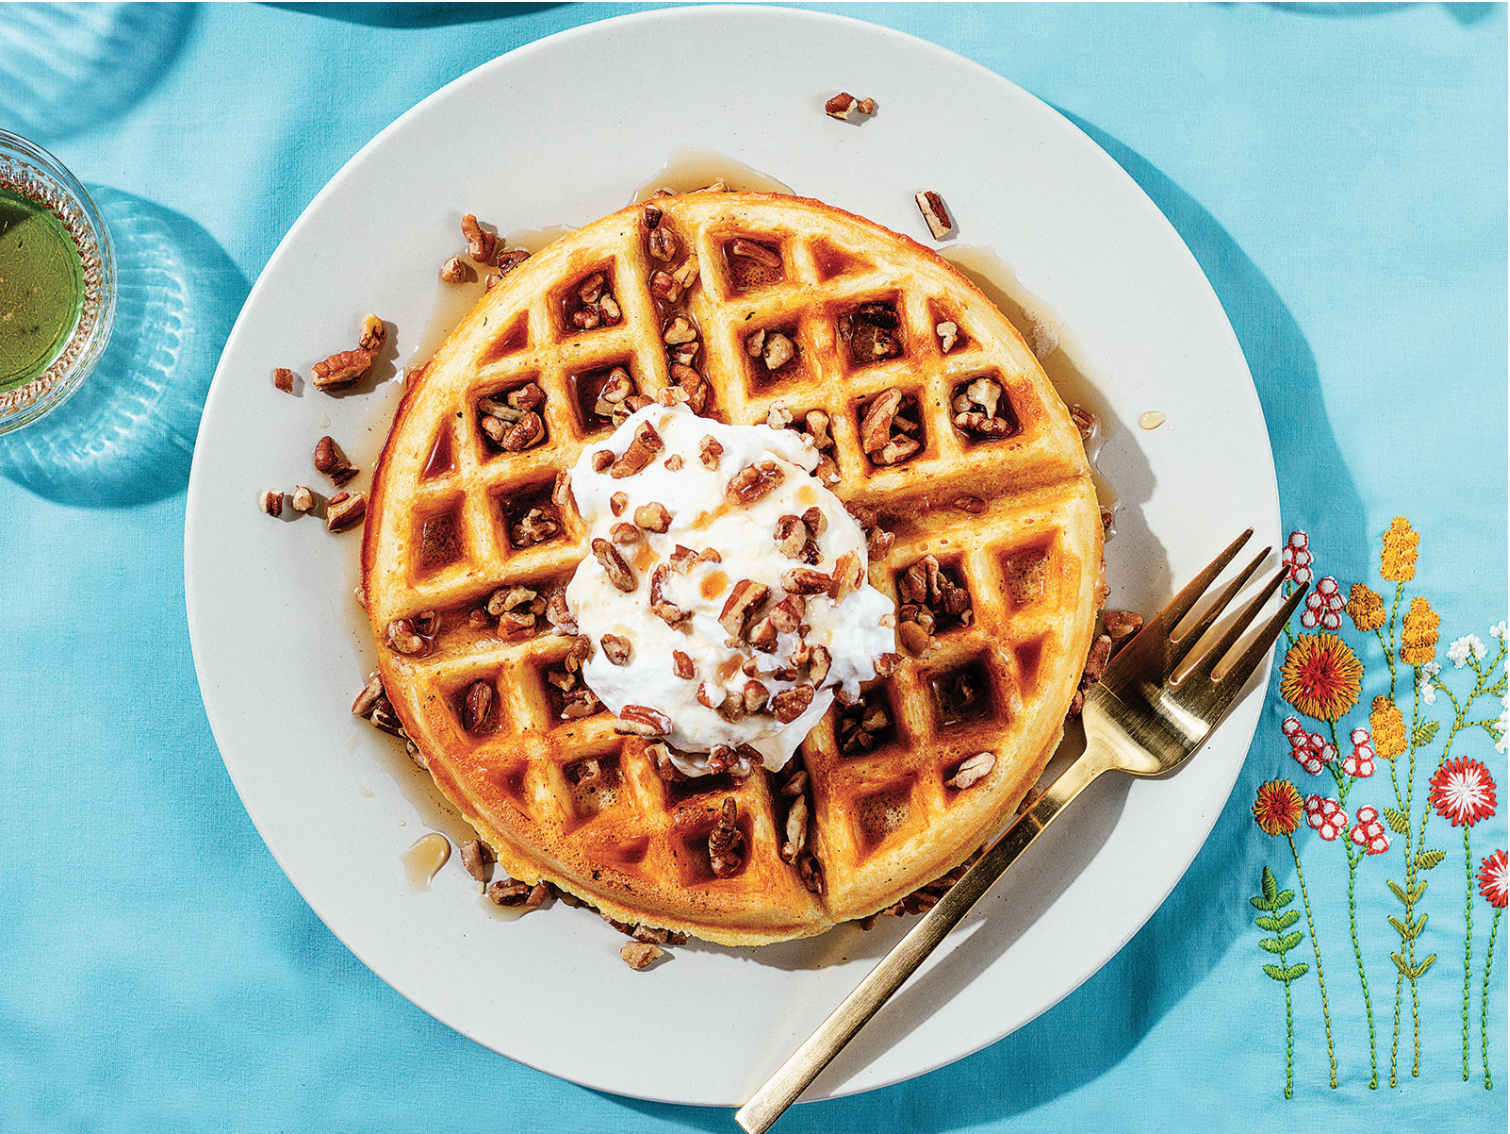 annette has denver's best waffle! (5280)